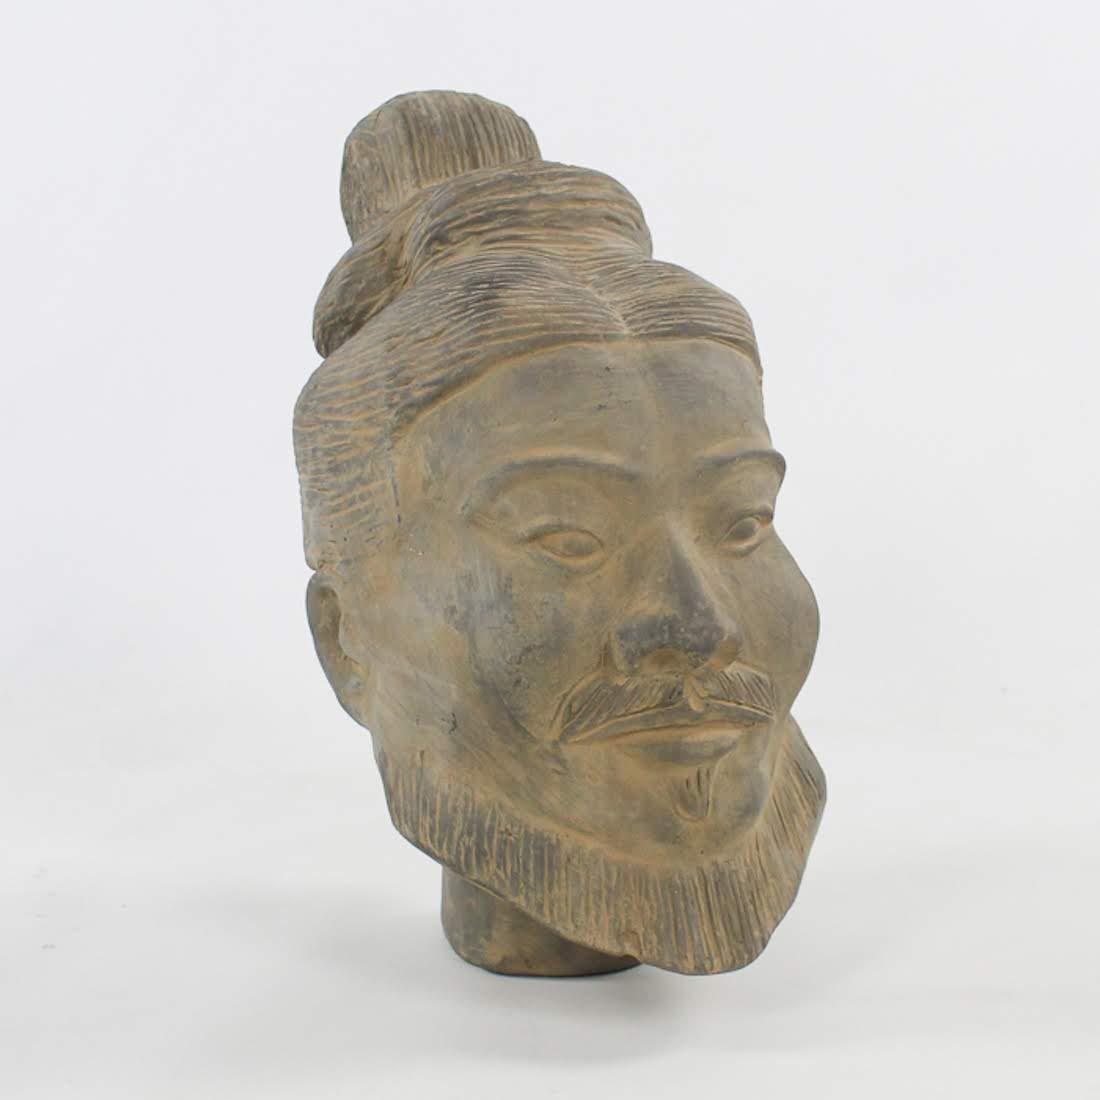 Chinese Xi'an Terracotta Warrior Head Full-Sized